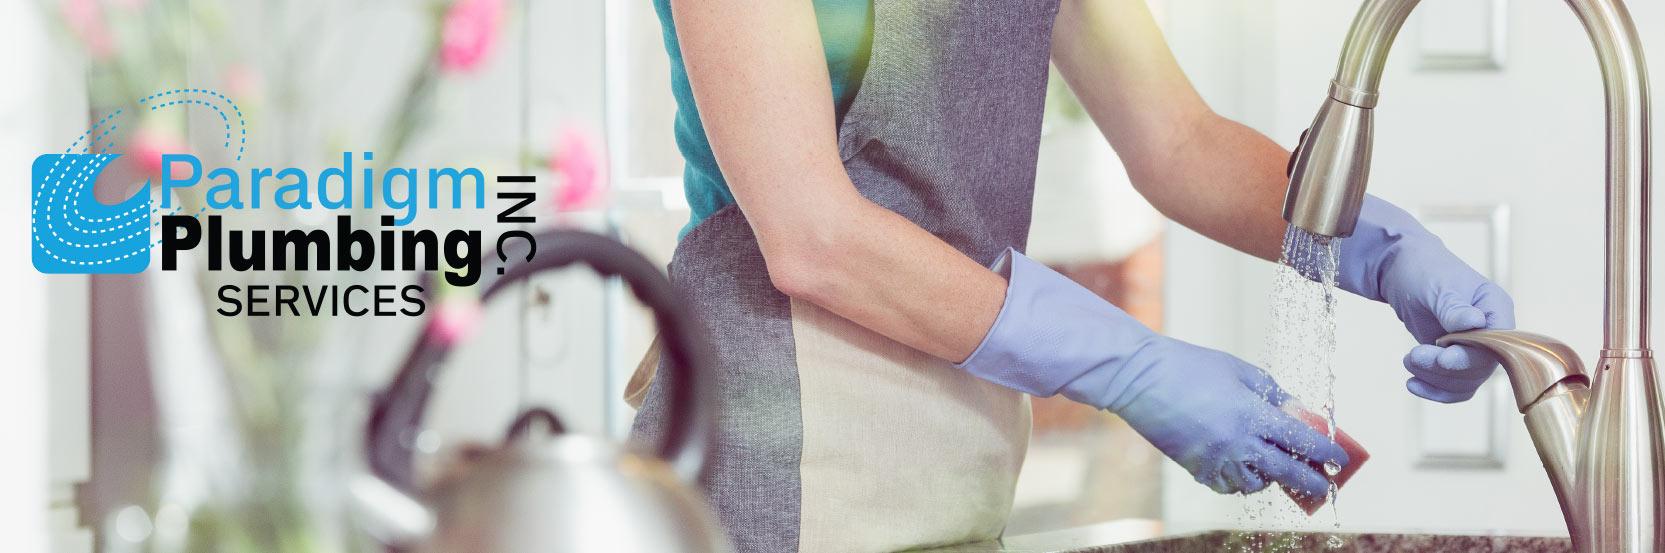 Paradigm Plumbing Woman Kitchen Faucet